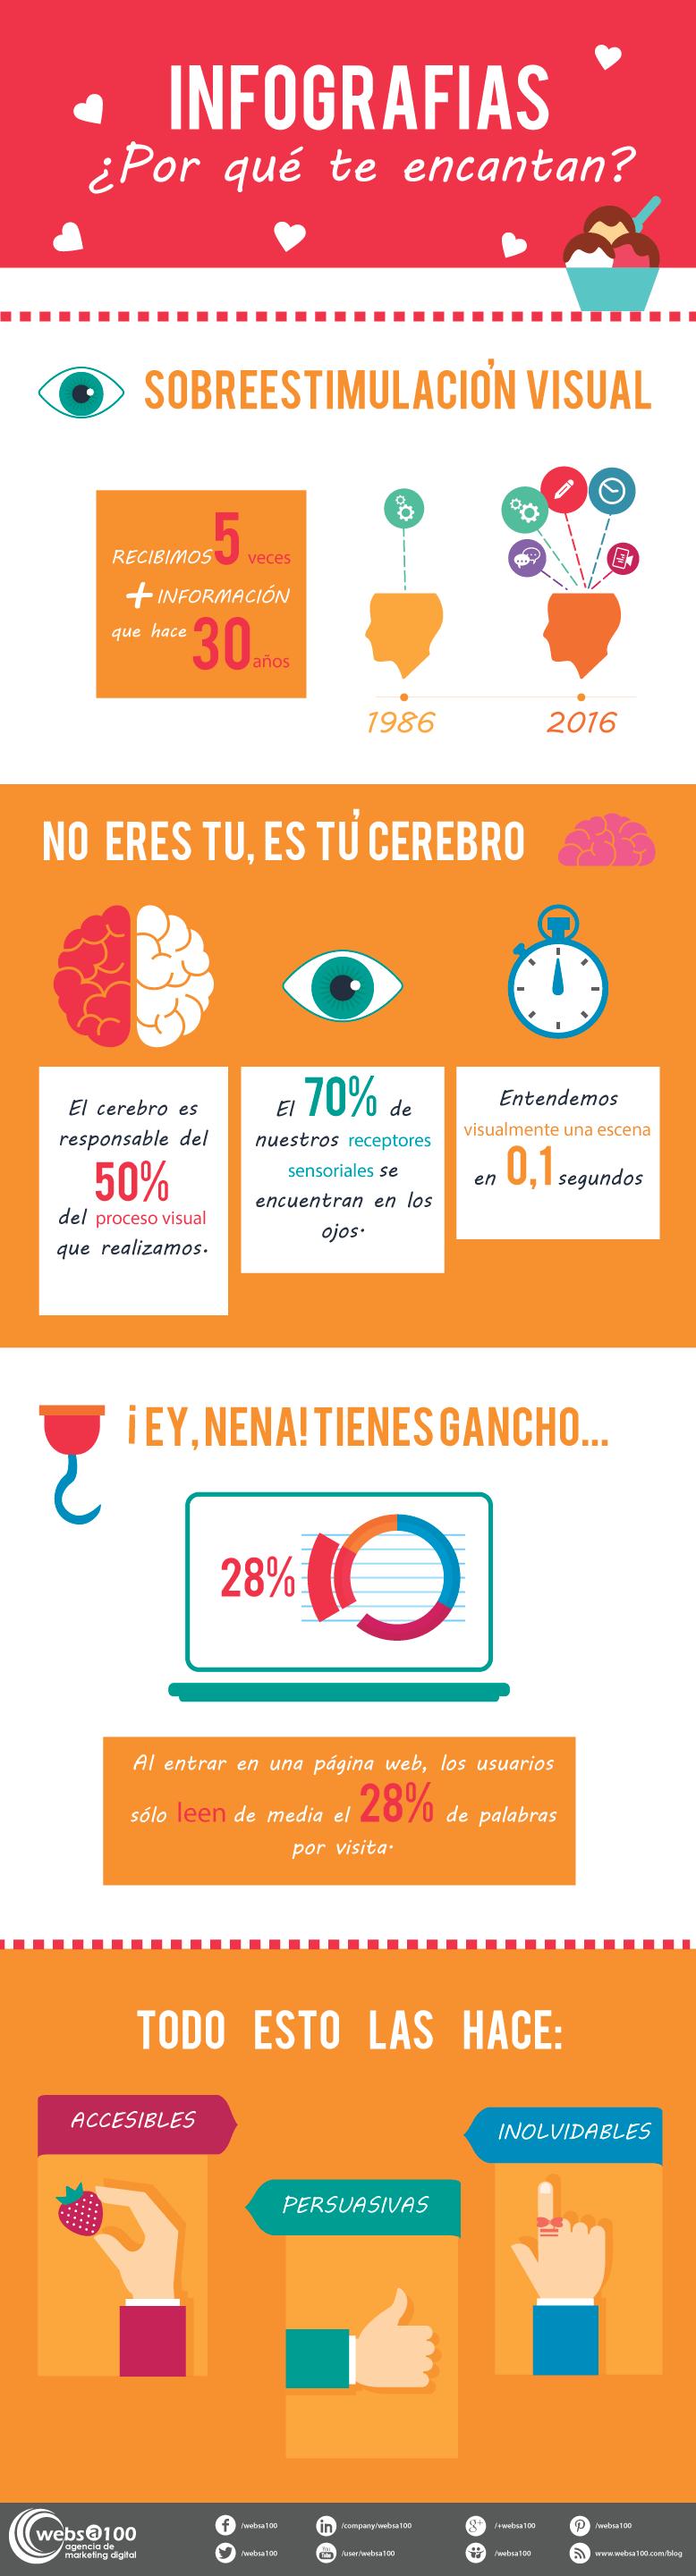 Infografías ¿Por qué te encantan?